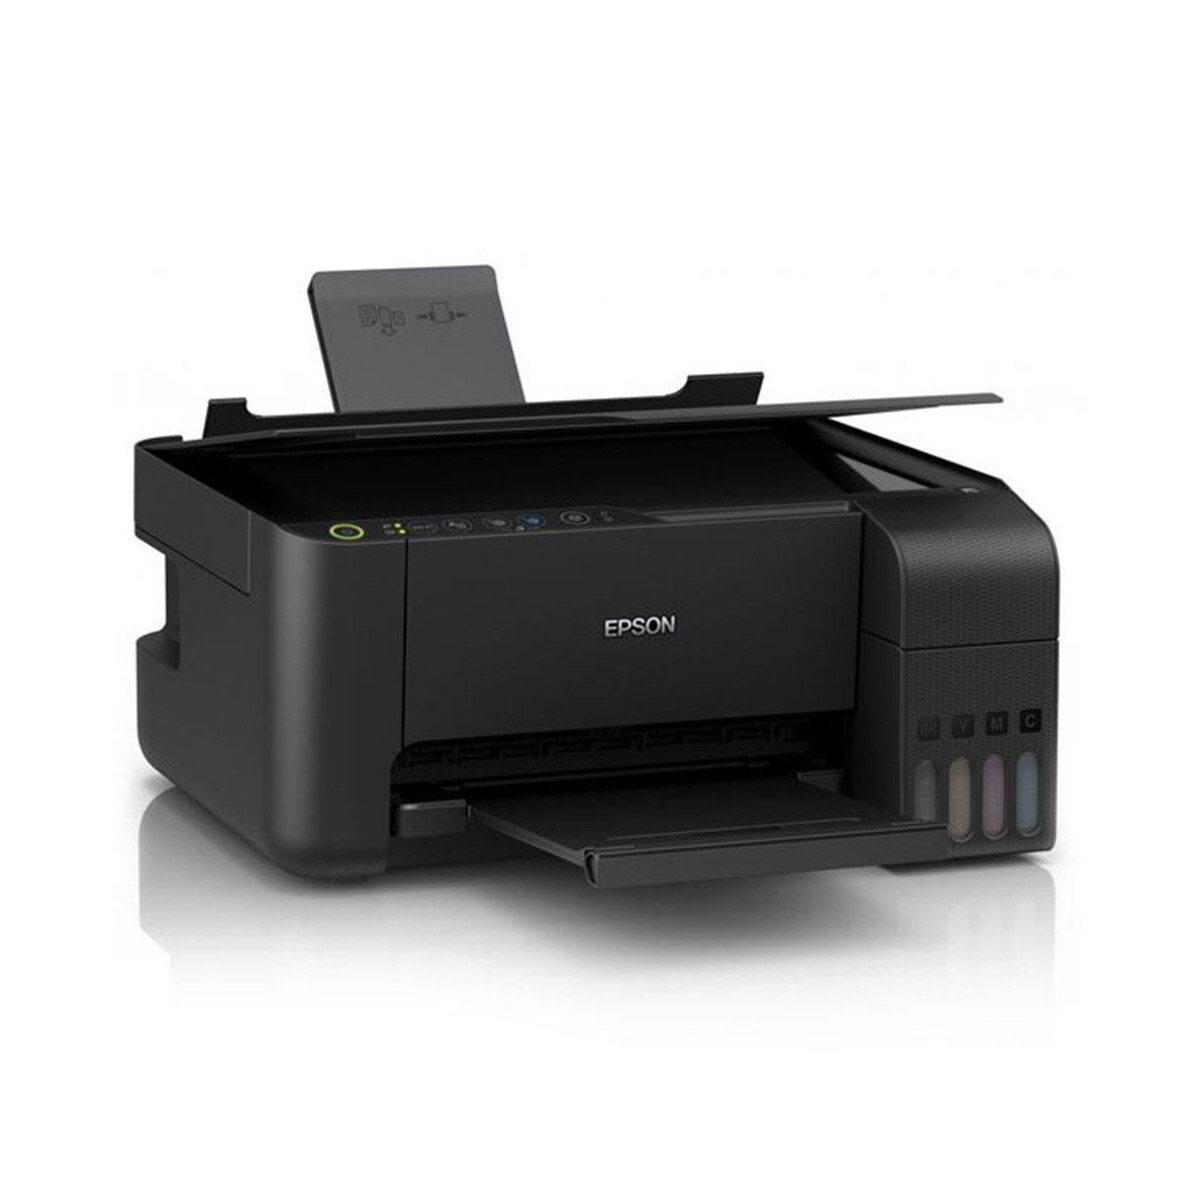 Epson EcoTank L3150 All-in-One Ink Tank Colour (Print/Scan/Copy/Wi-Fi) Printer